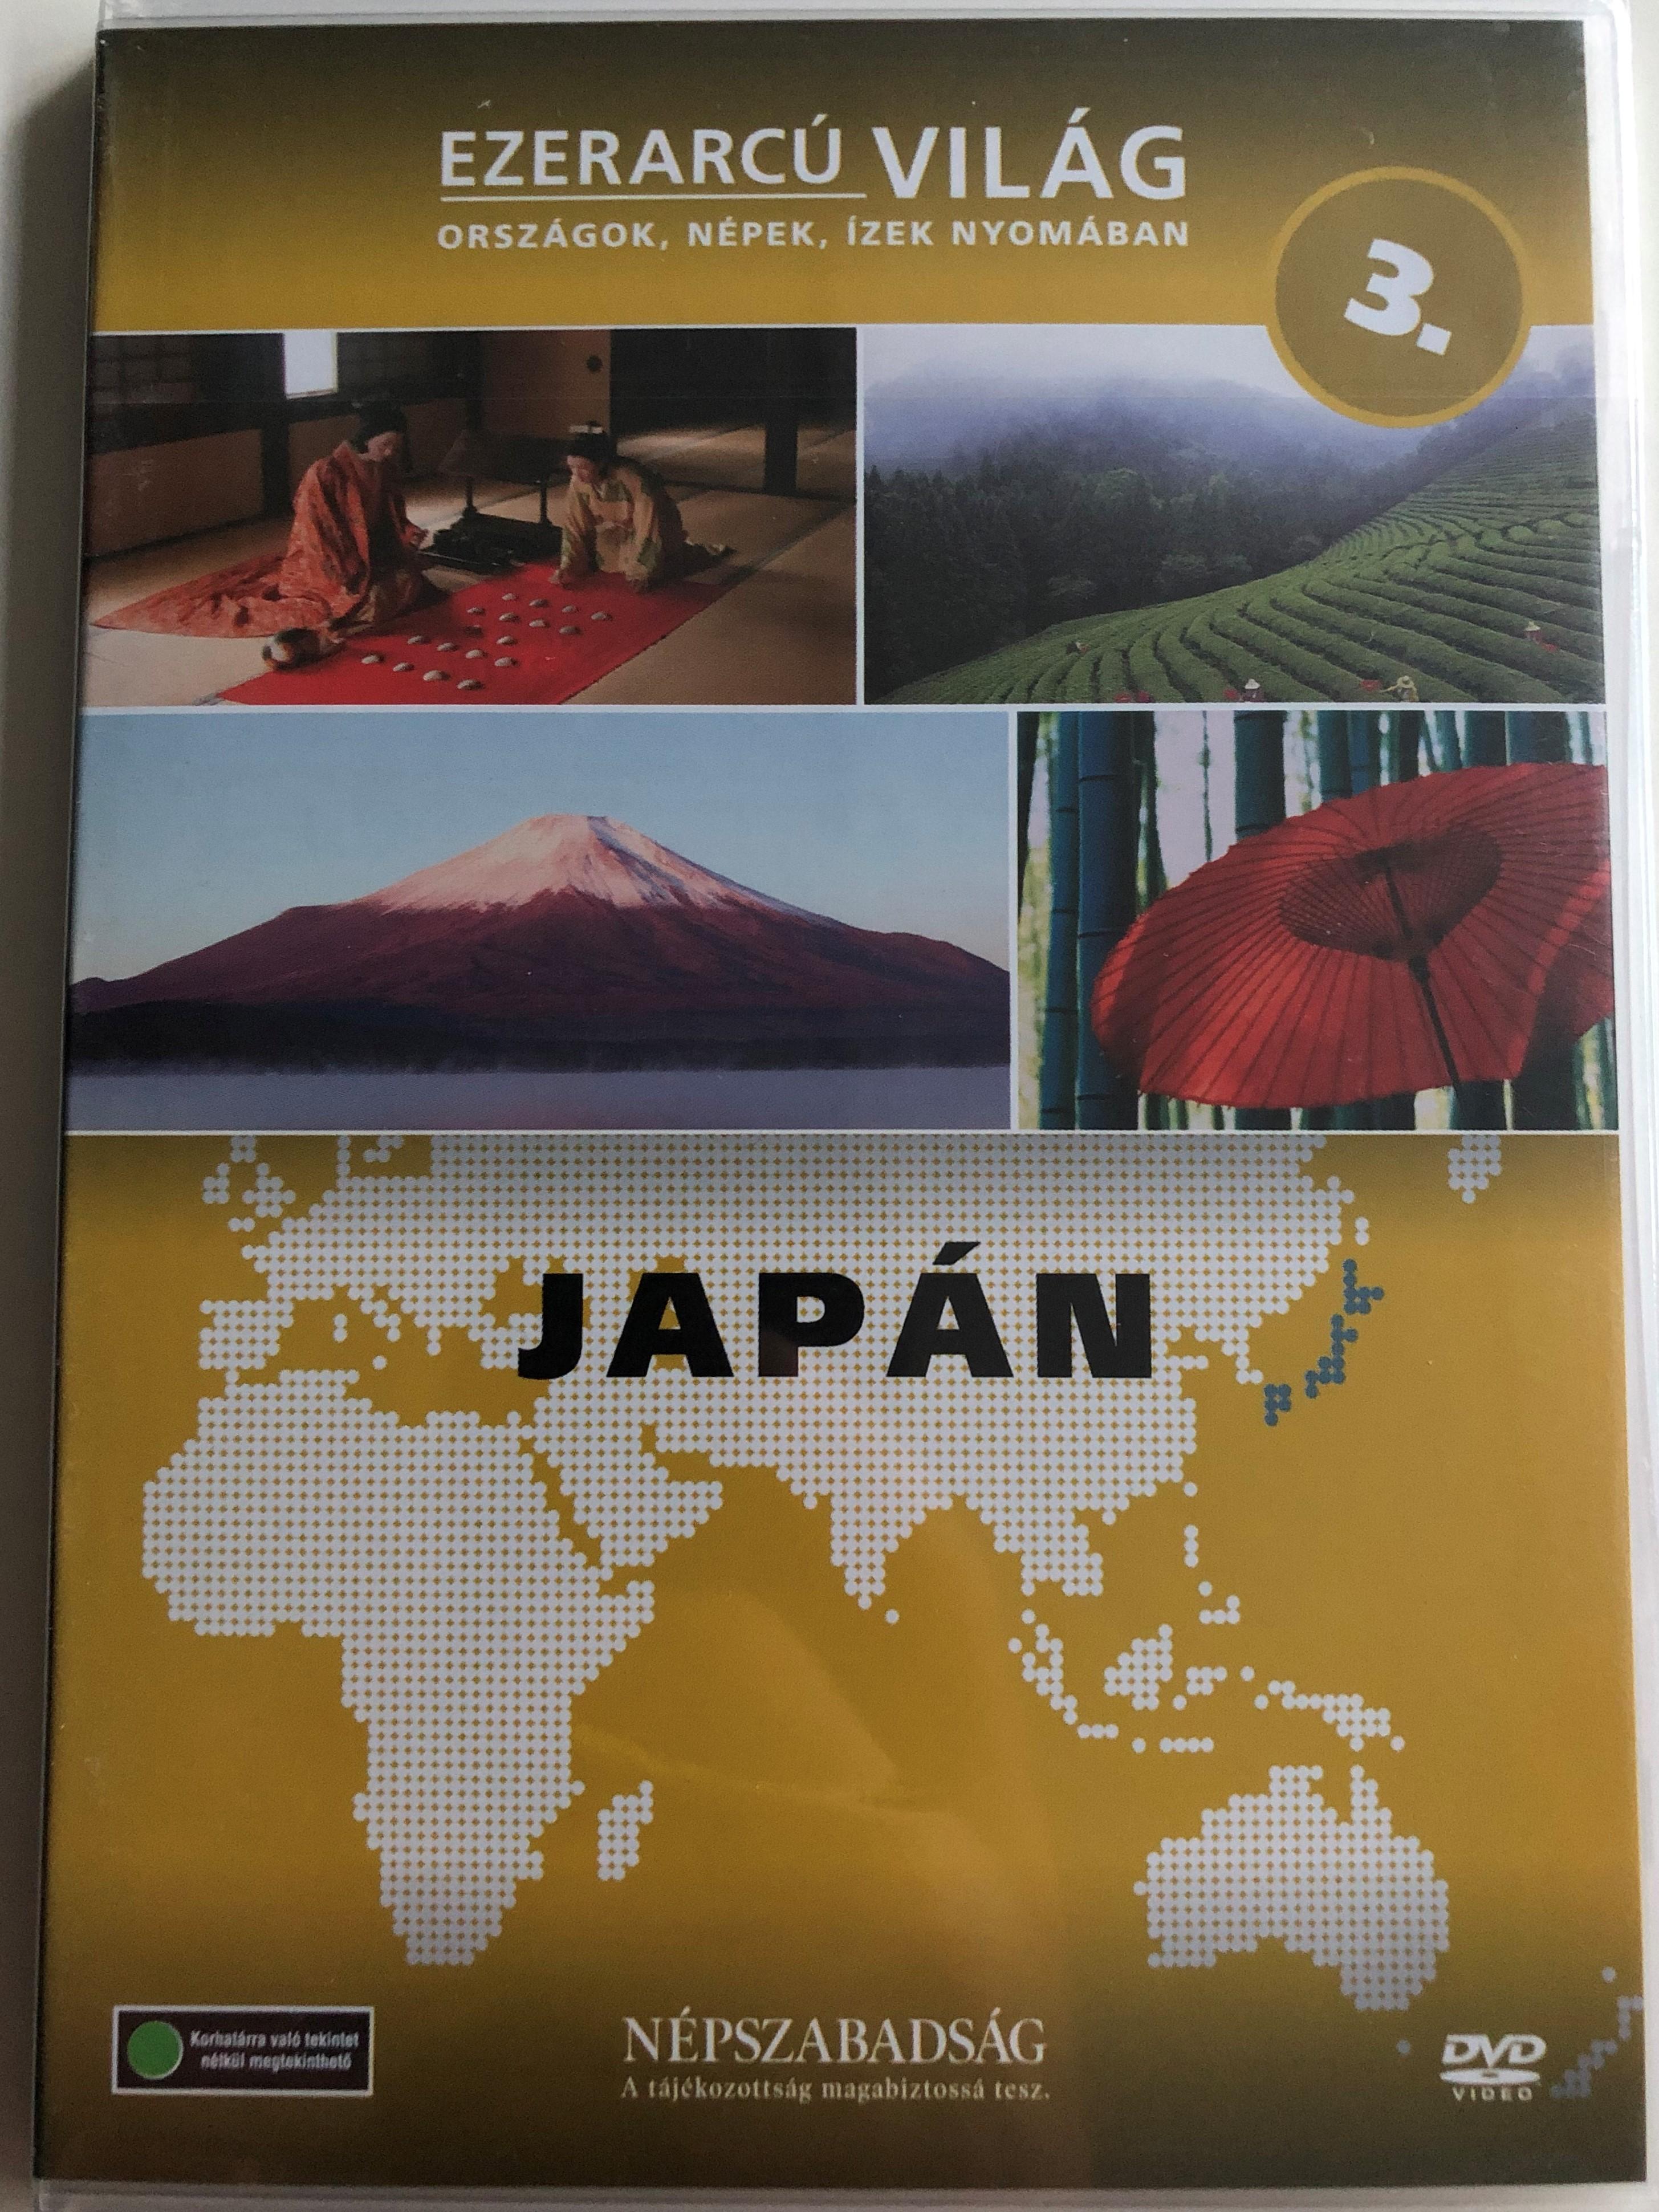 ezerarc-vil-g-vol.-3-jap-n-japan-dvd-2009-orsz-gok-n-pek-zek-nyom-ban-20-x-dvd-set-2009-n-pszabads-g-premier-media-pilot-film-documentary-series-about-our-world-1-.jpg